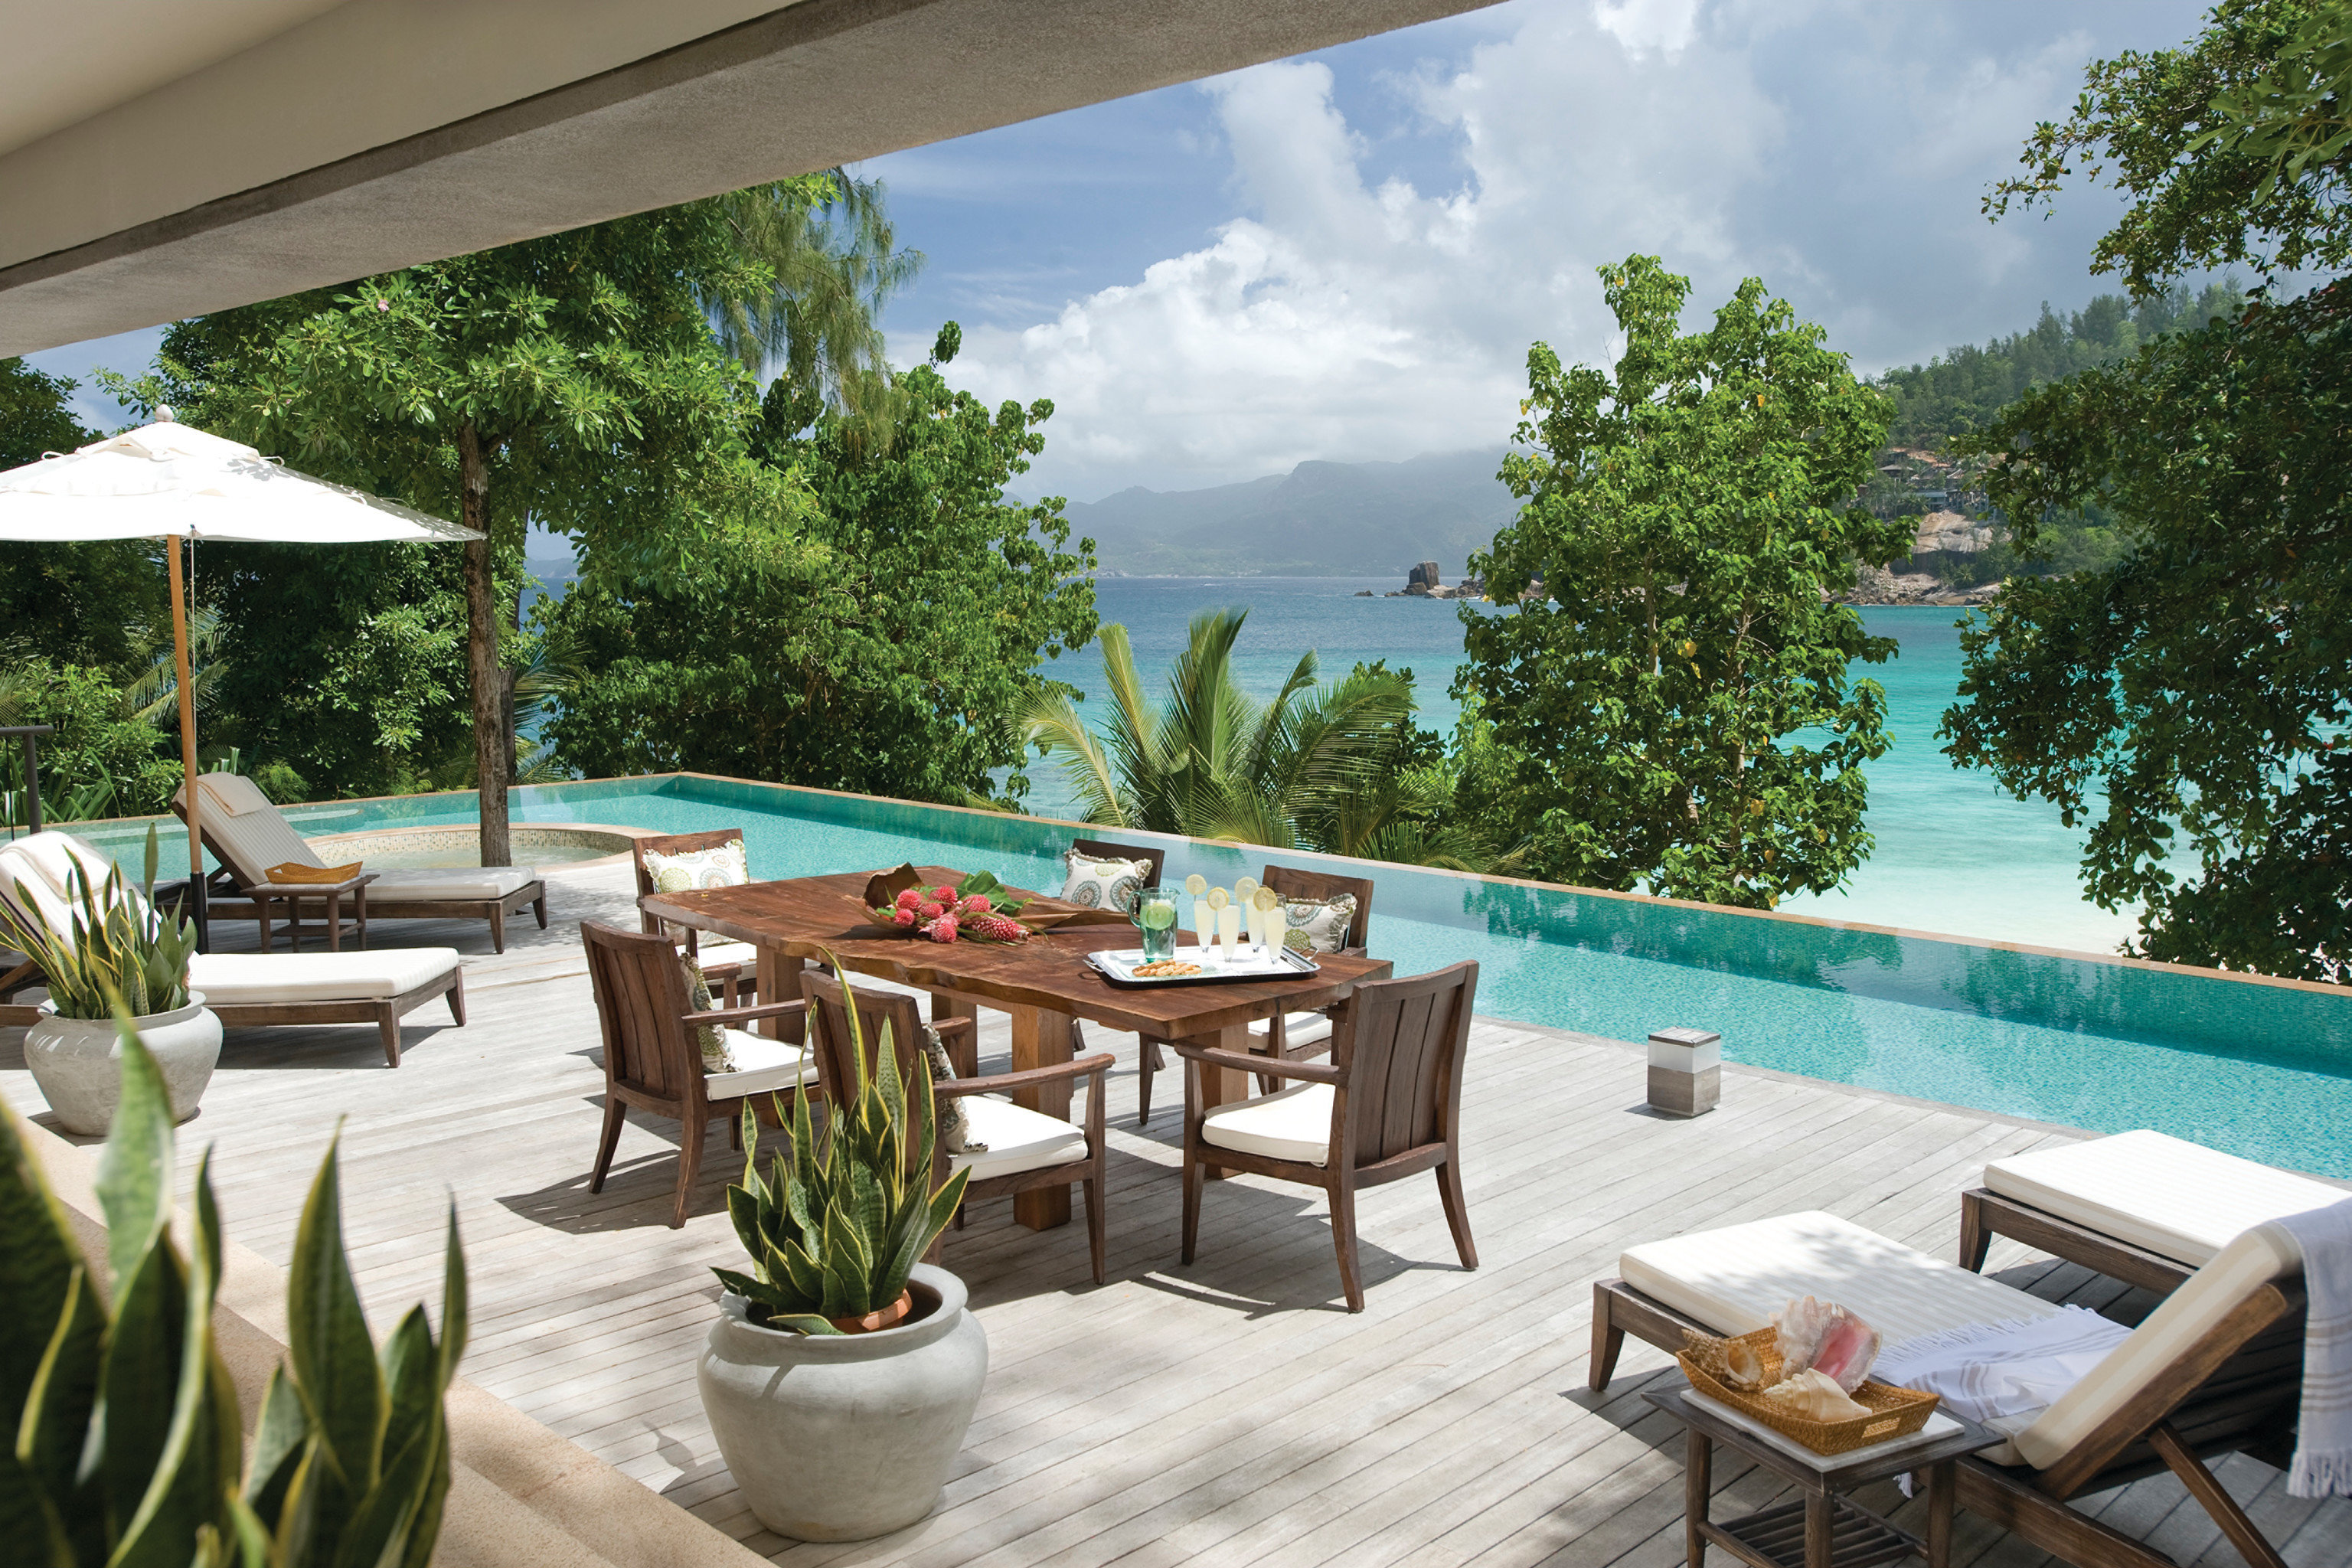 Trip Ideas tree property building Resort Villa swimming pool home backyard caribbean cottage condominium hacienda porch Deck